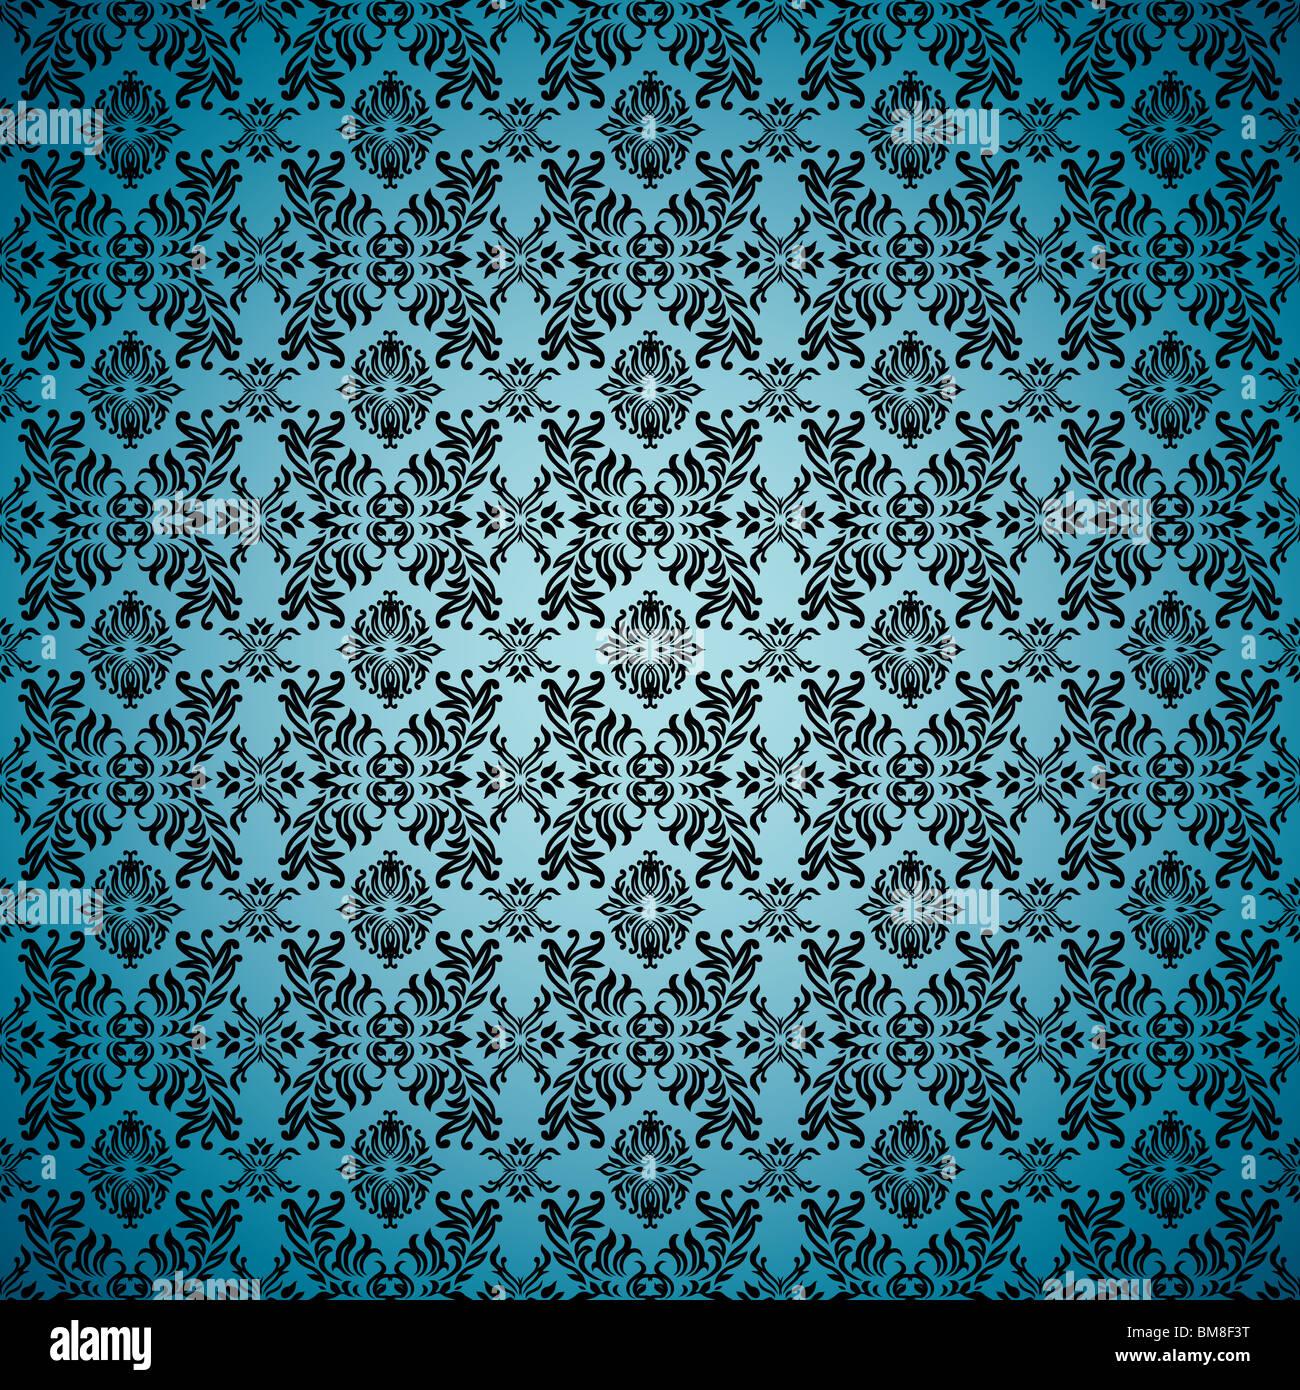 gothic patterns wallpaper pattern - photo #20